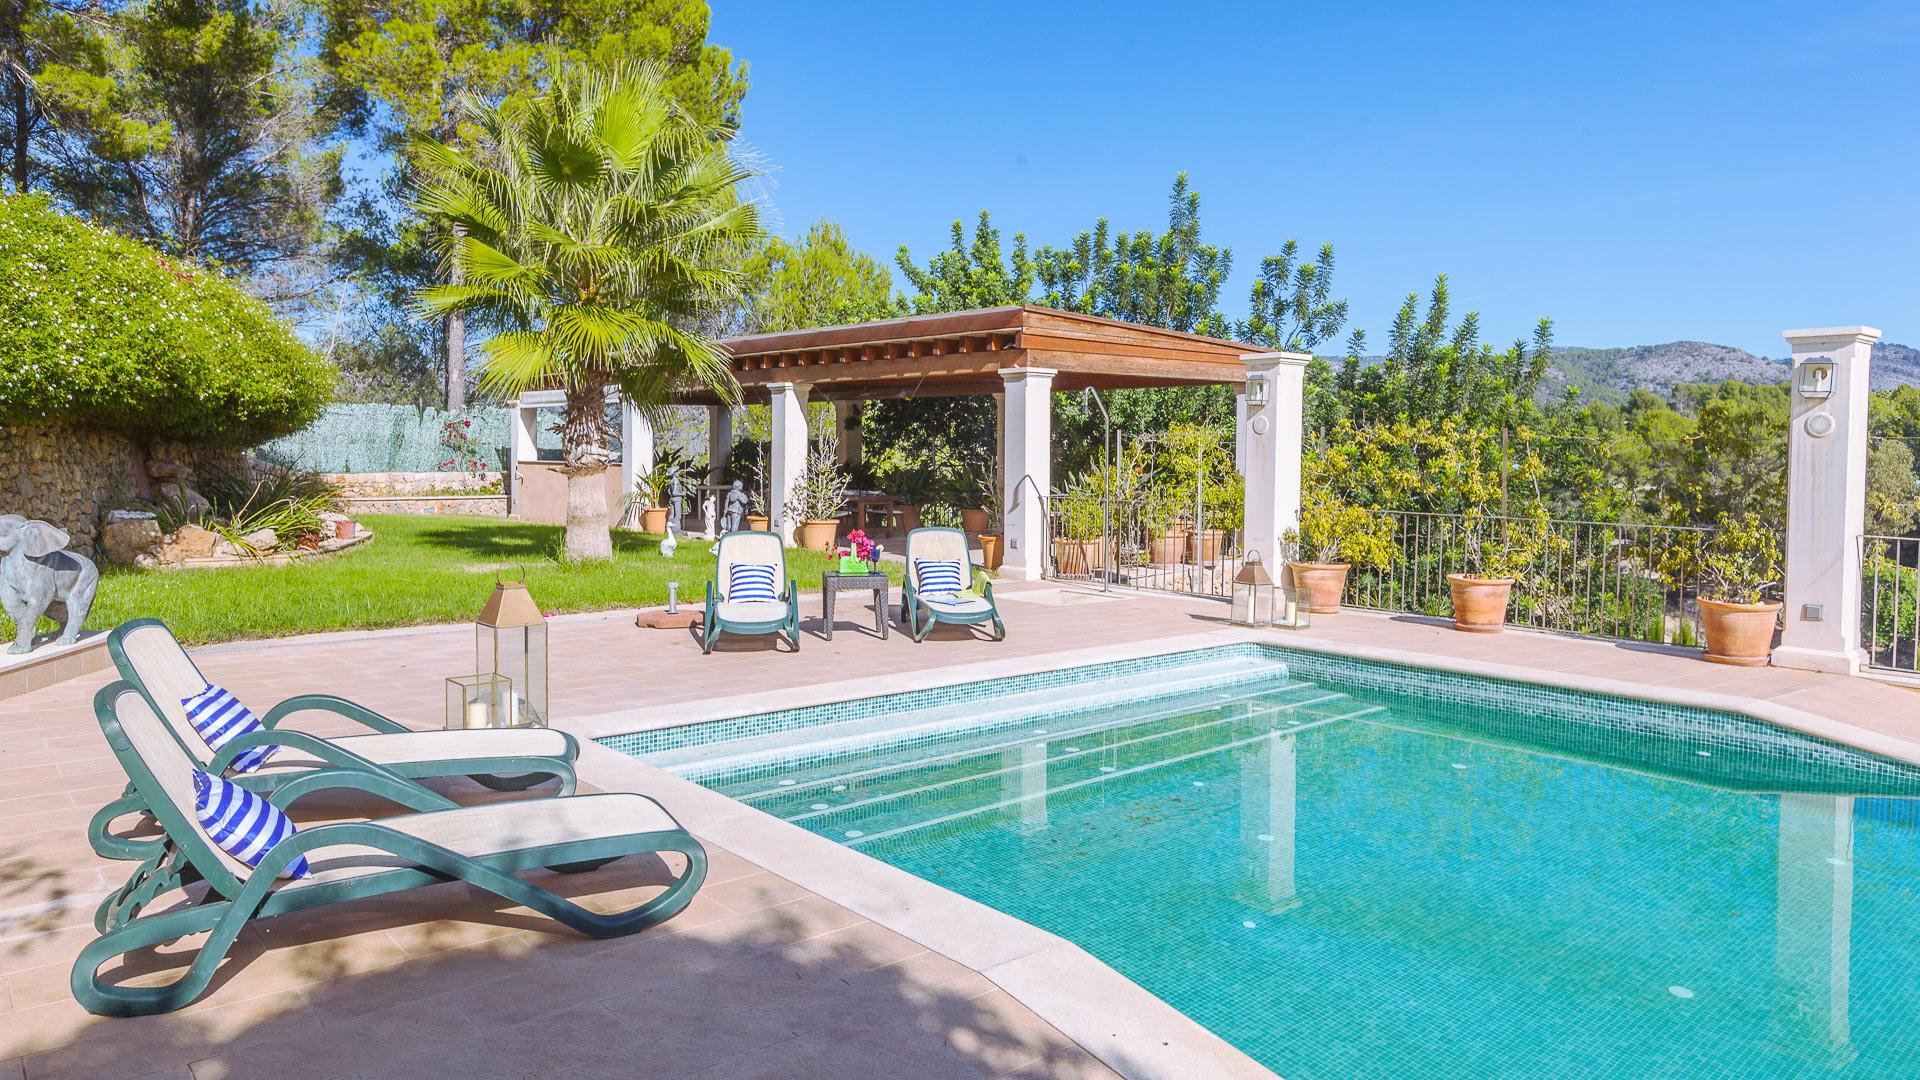 Villa caridad villa mieten in mallorca s dwesten for Mallorca villa mieten